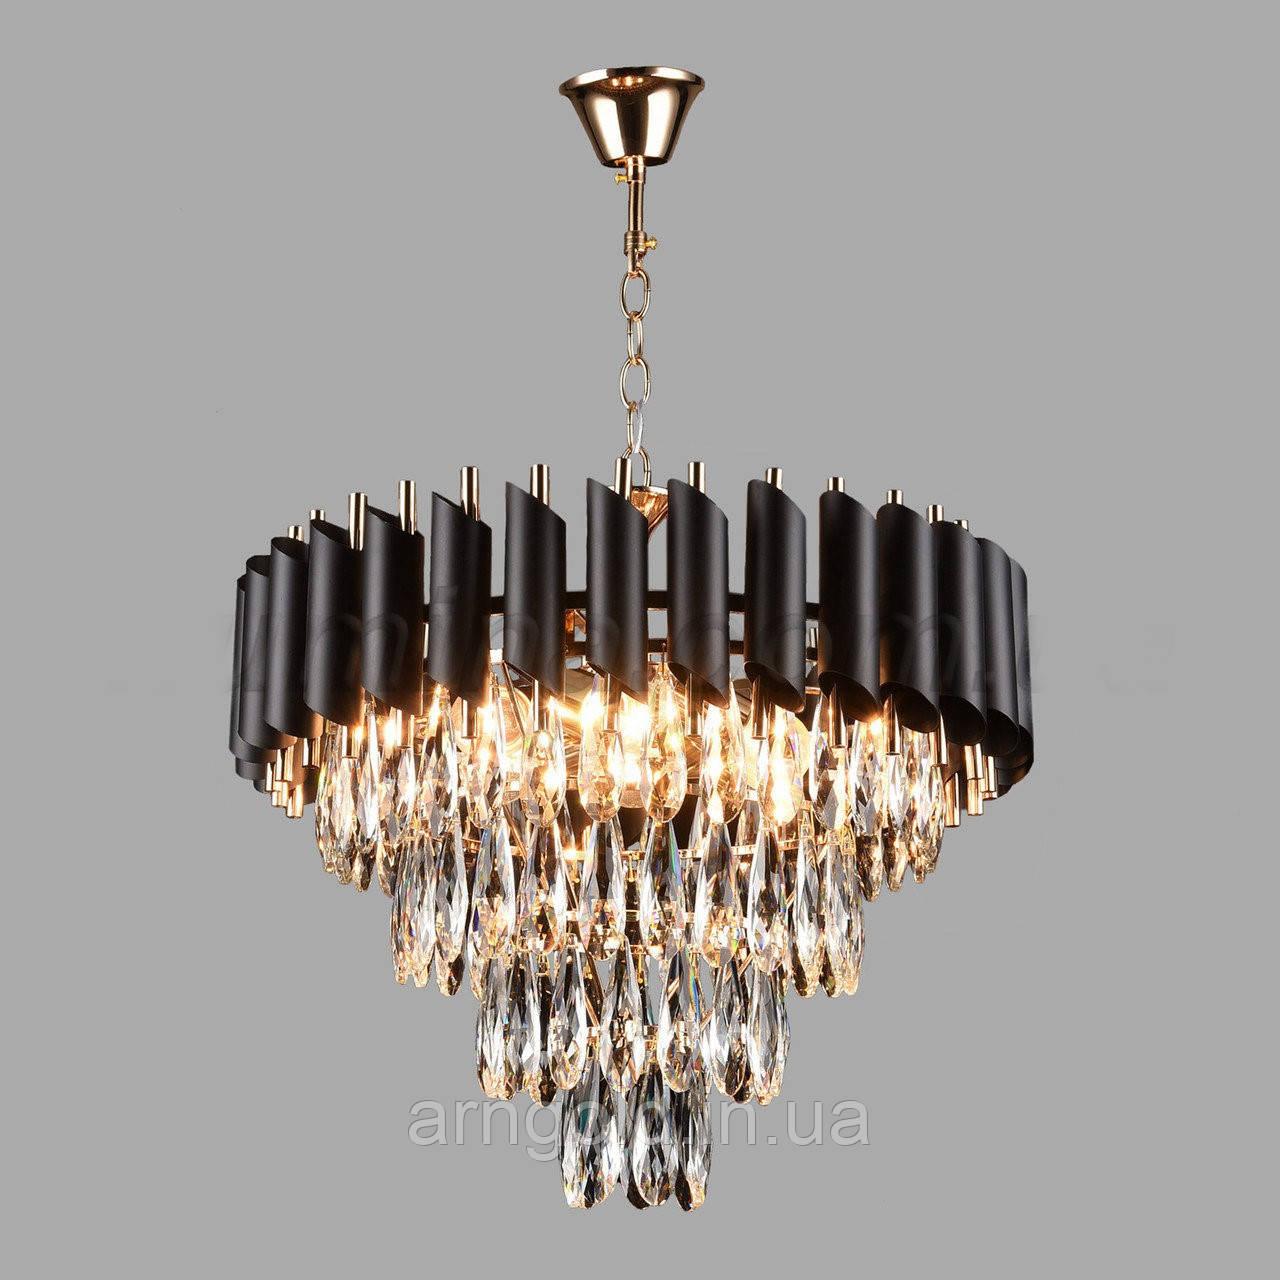 Подвесная люстра хрустальная на шесть ламп 3-E1721/6 D470